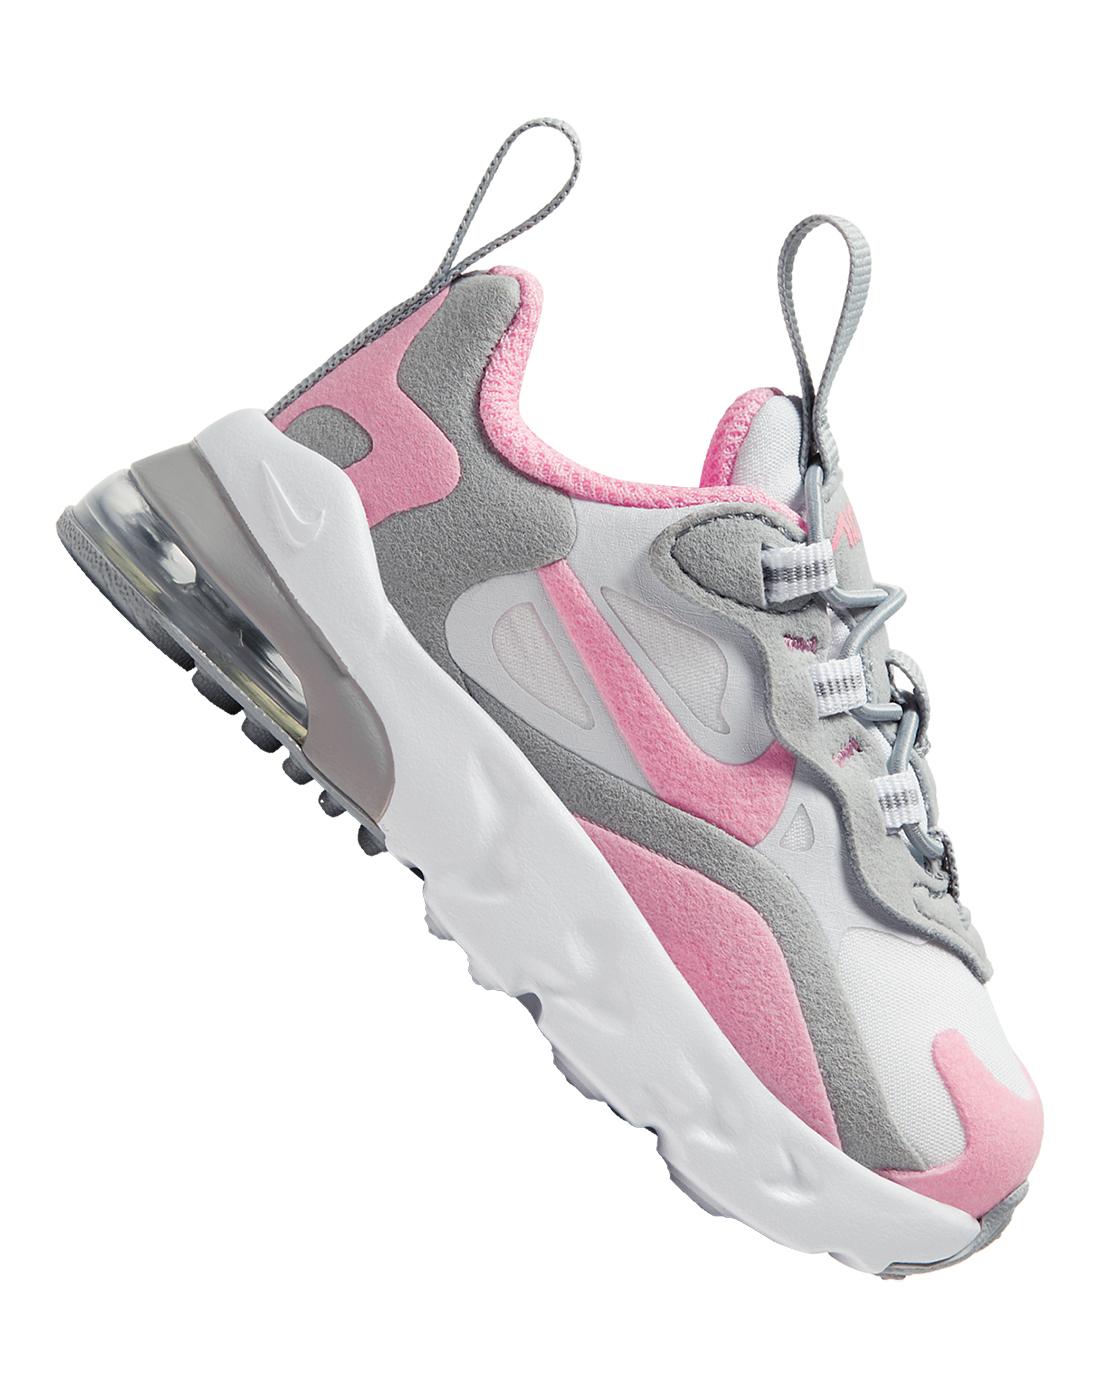 Nike Infant Girls Air Max 270 RT